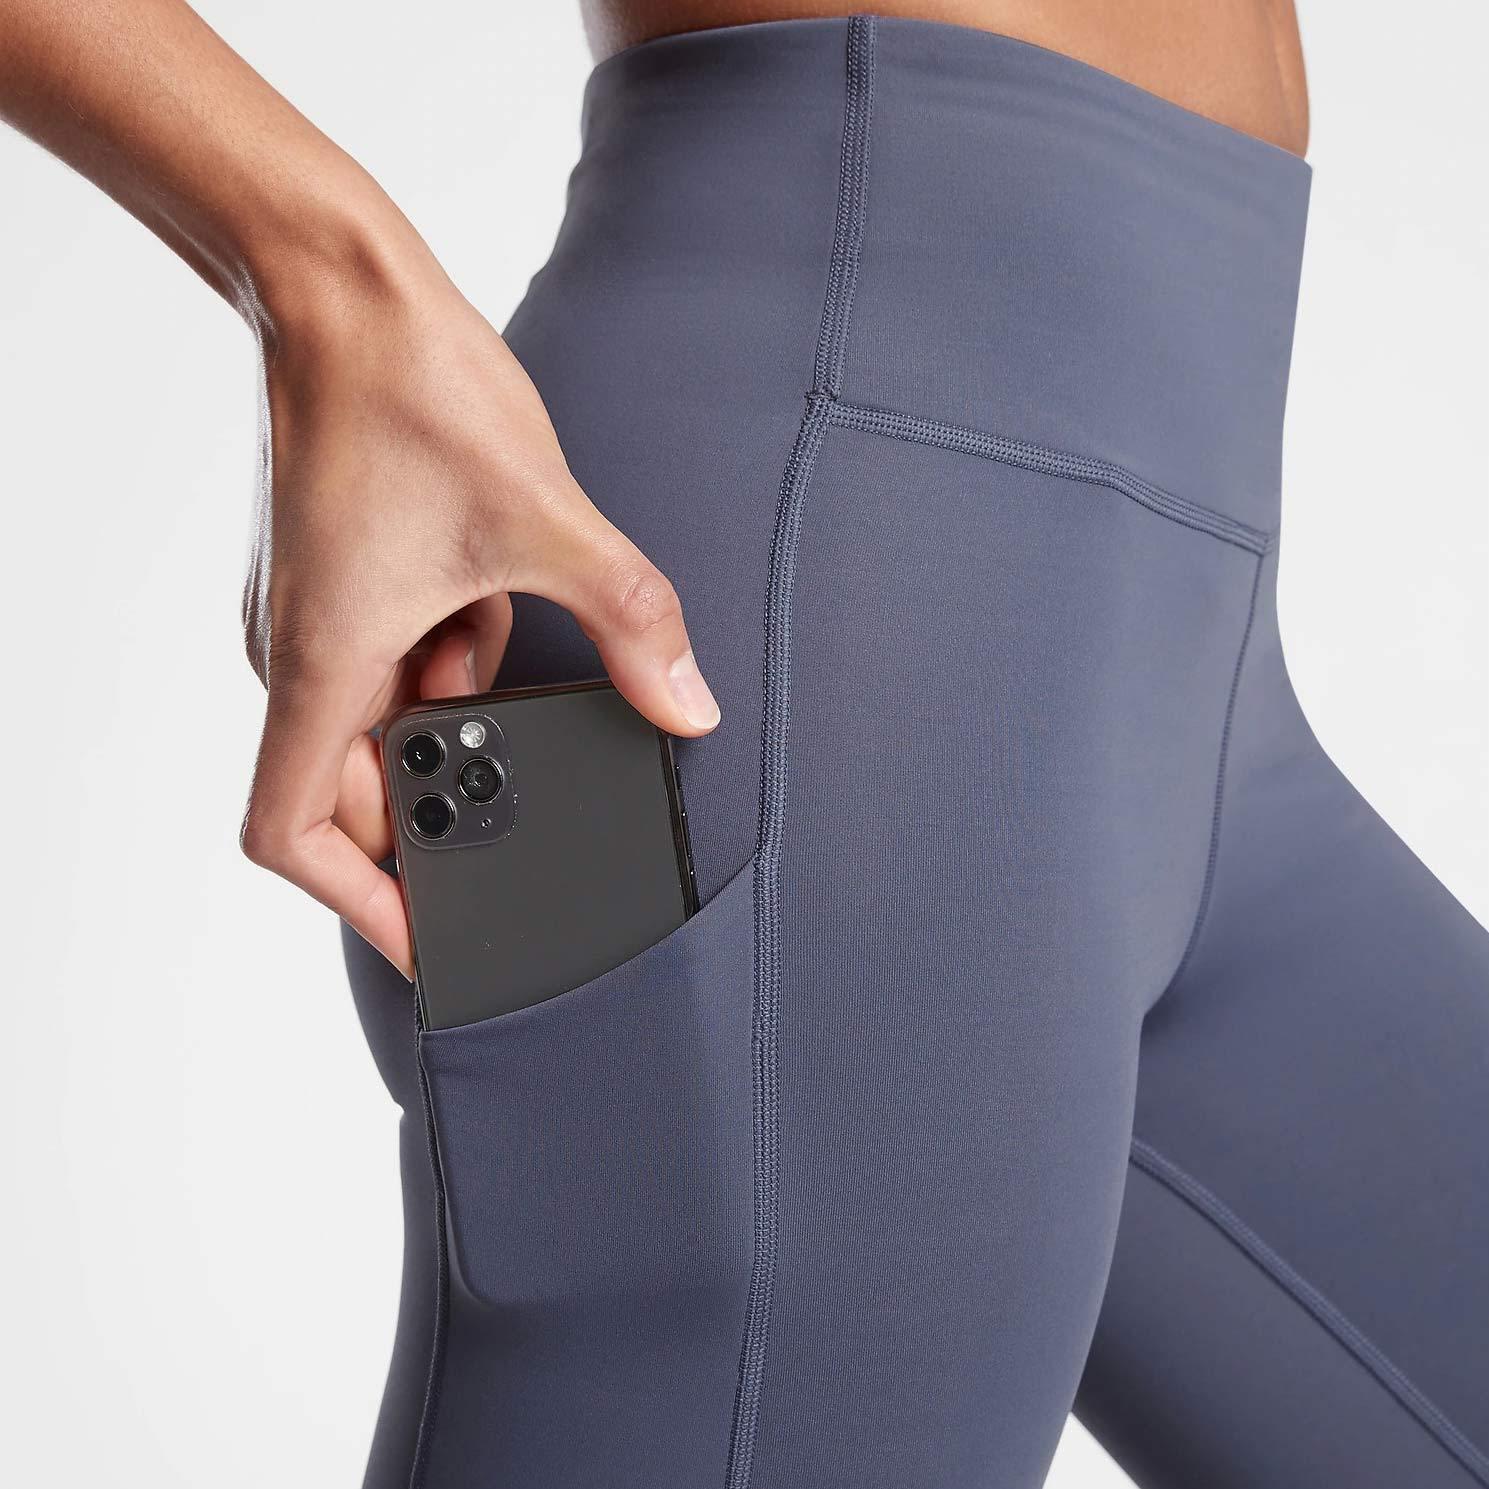 capri leggings with pockets